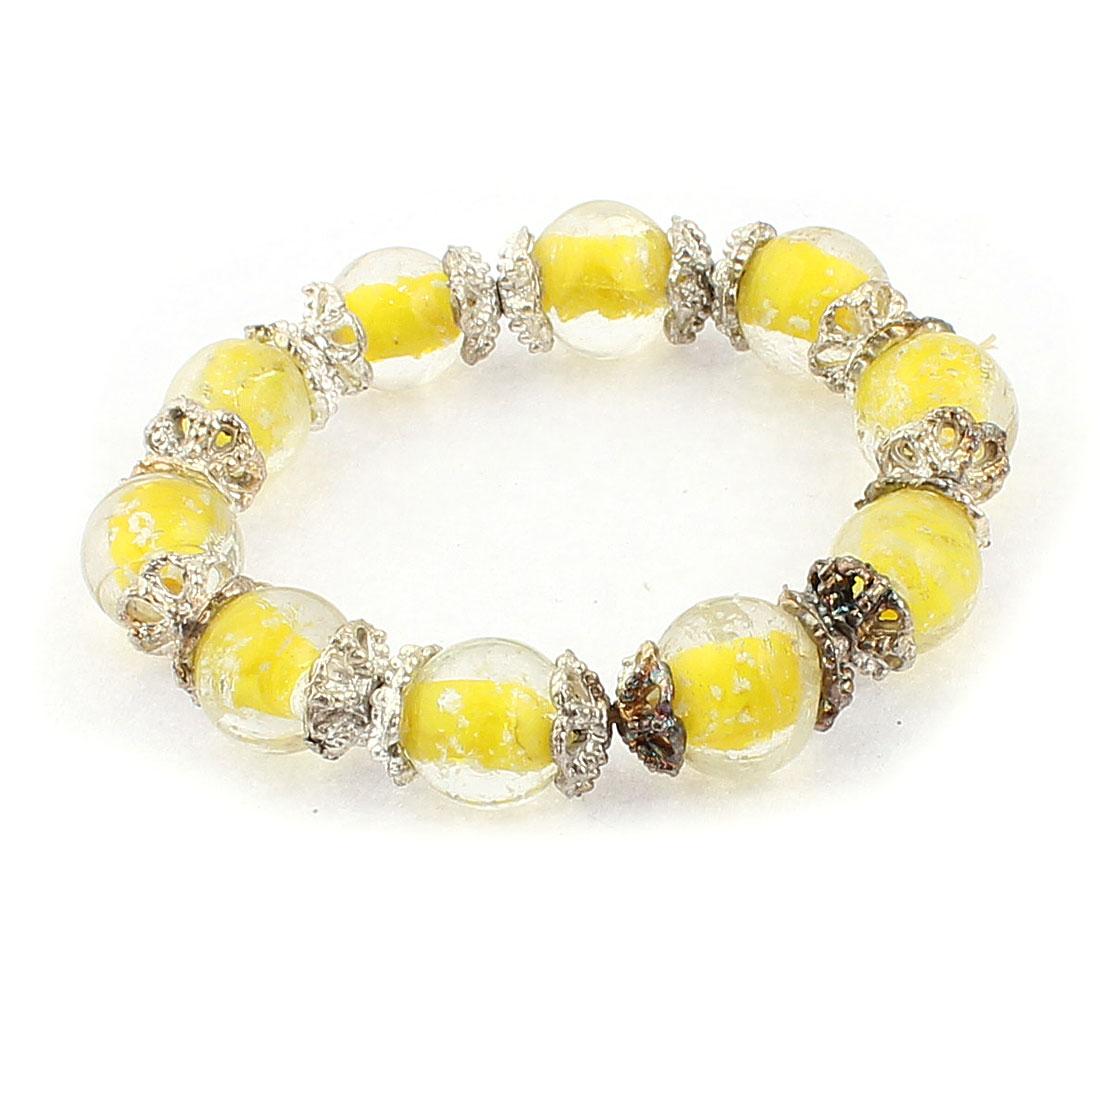 Lady Plastic Luminous Round Balls Flower Decor Elastics Bracelet Yellow